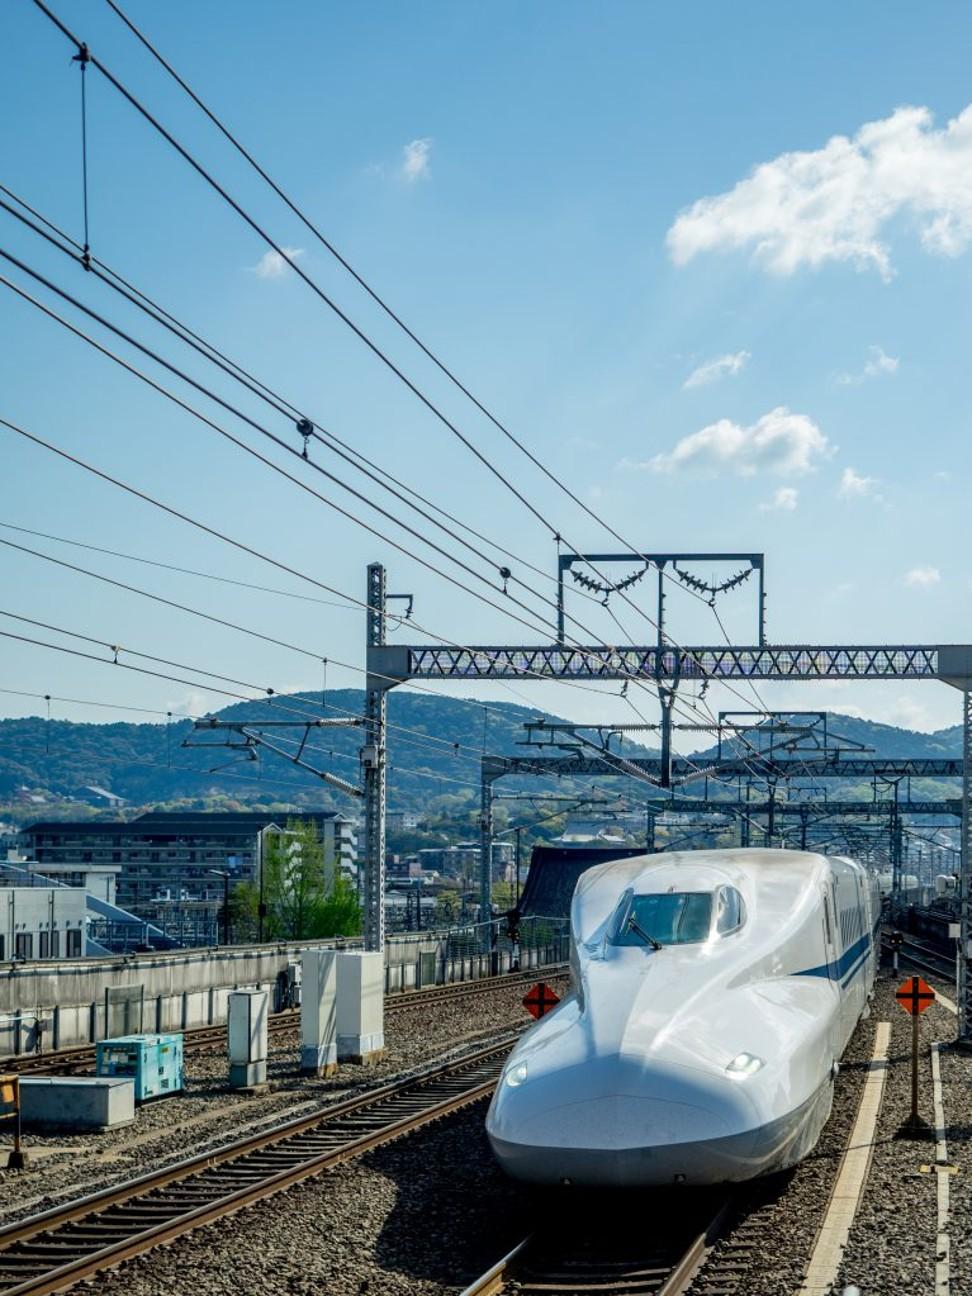 Shinkansen bullet train. Photo: Ajay Suresh